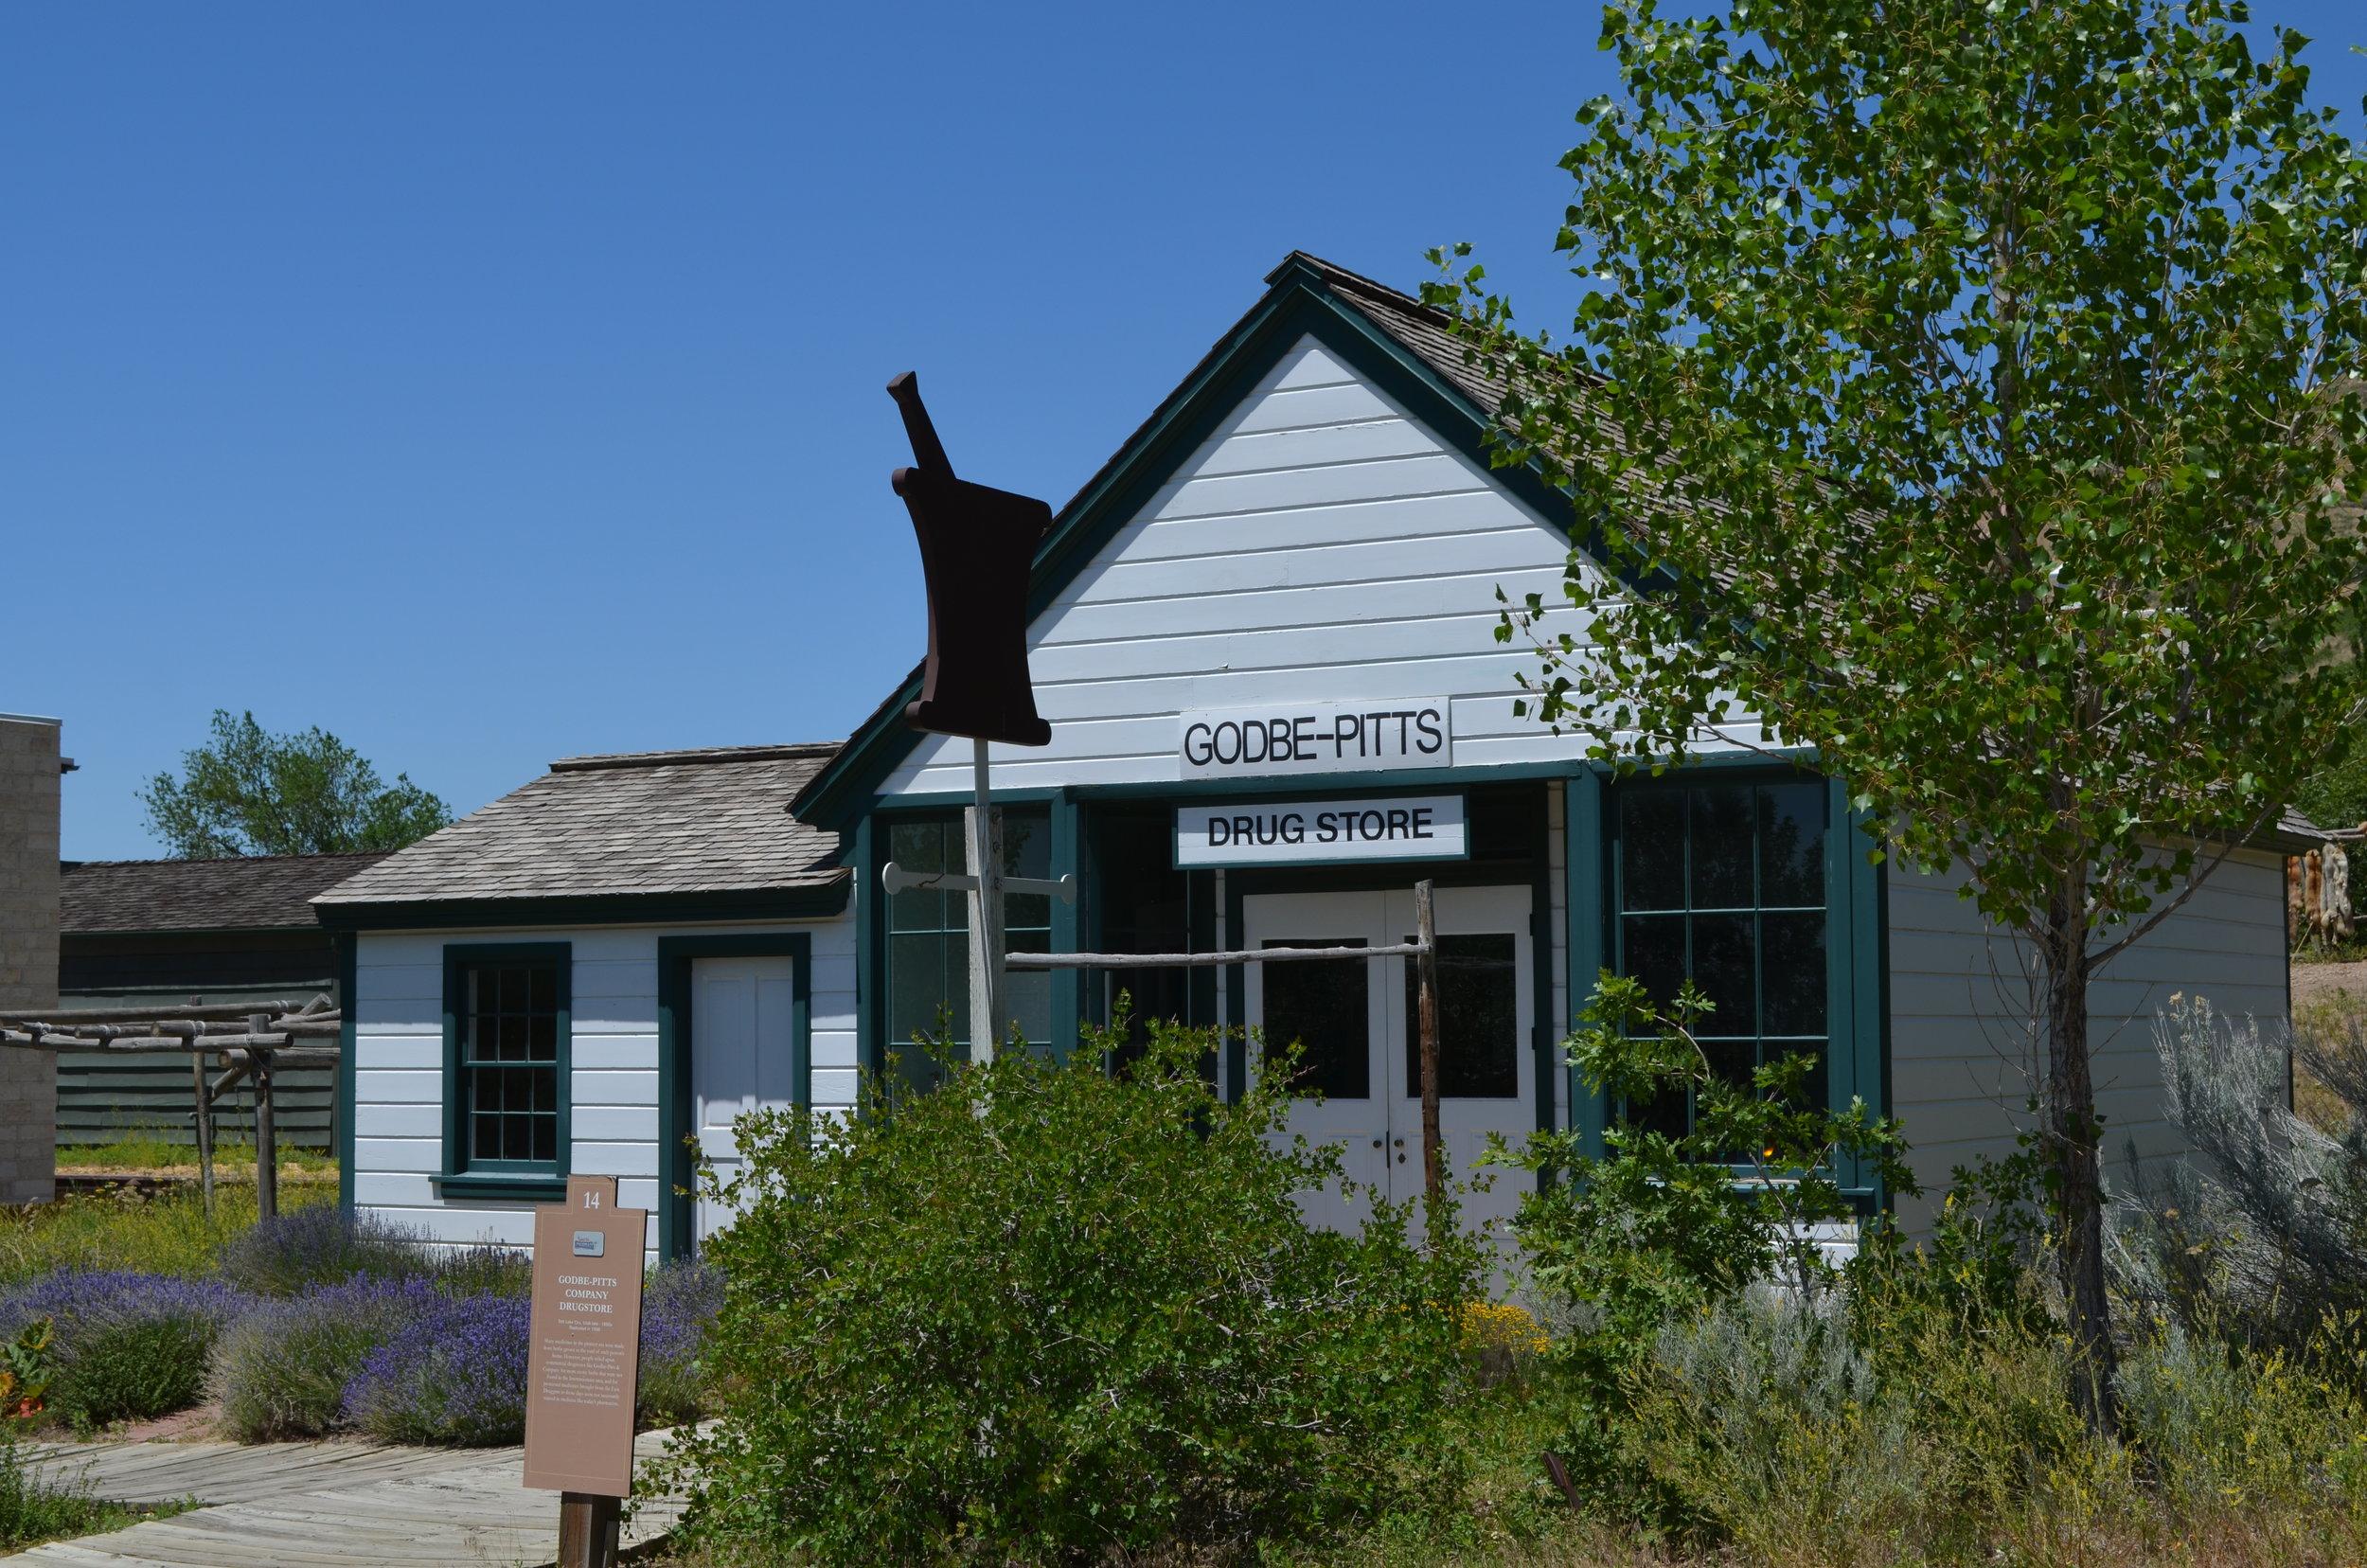 Godbe-Pitts and Company Drugstore